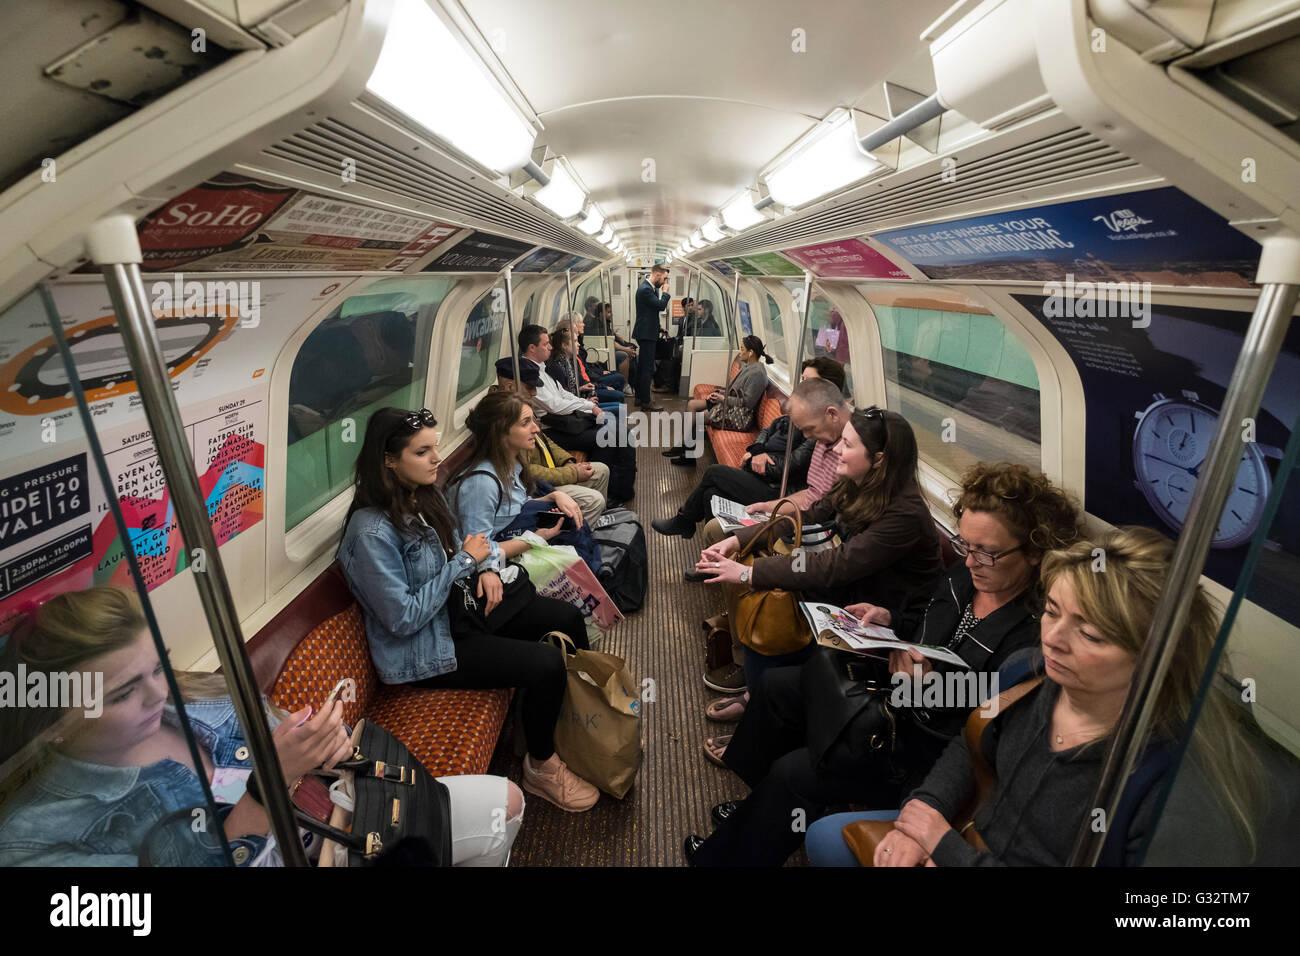 Interior of carriage on Glasgow Underground system in Scotland, united Kingdom - Stock Image